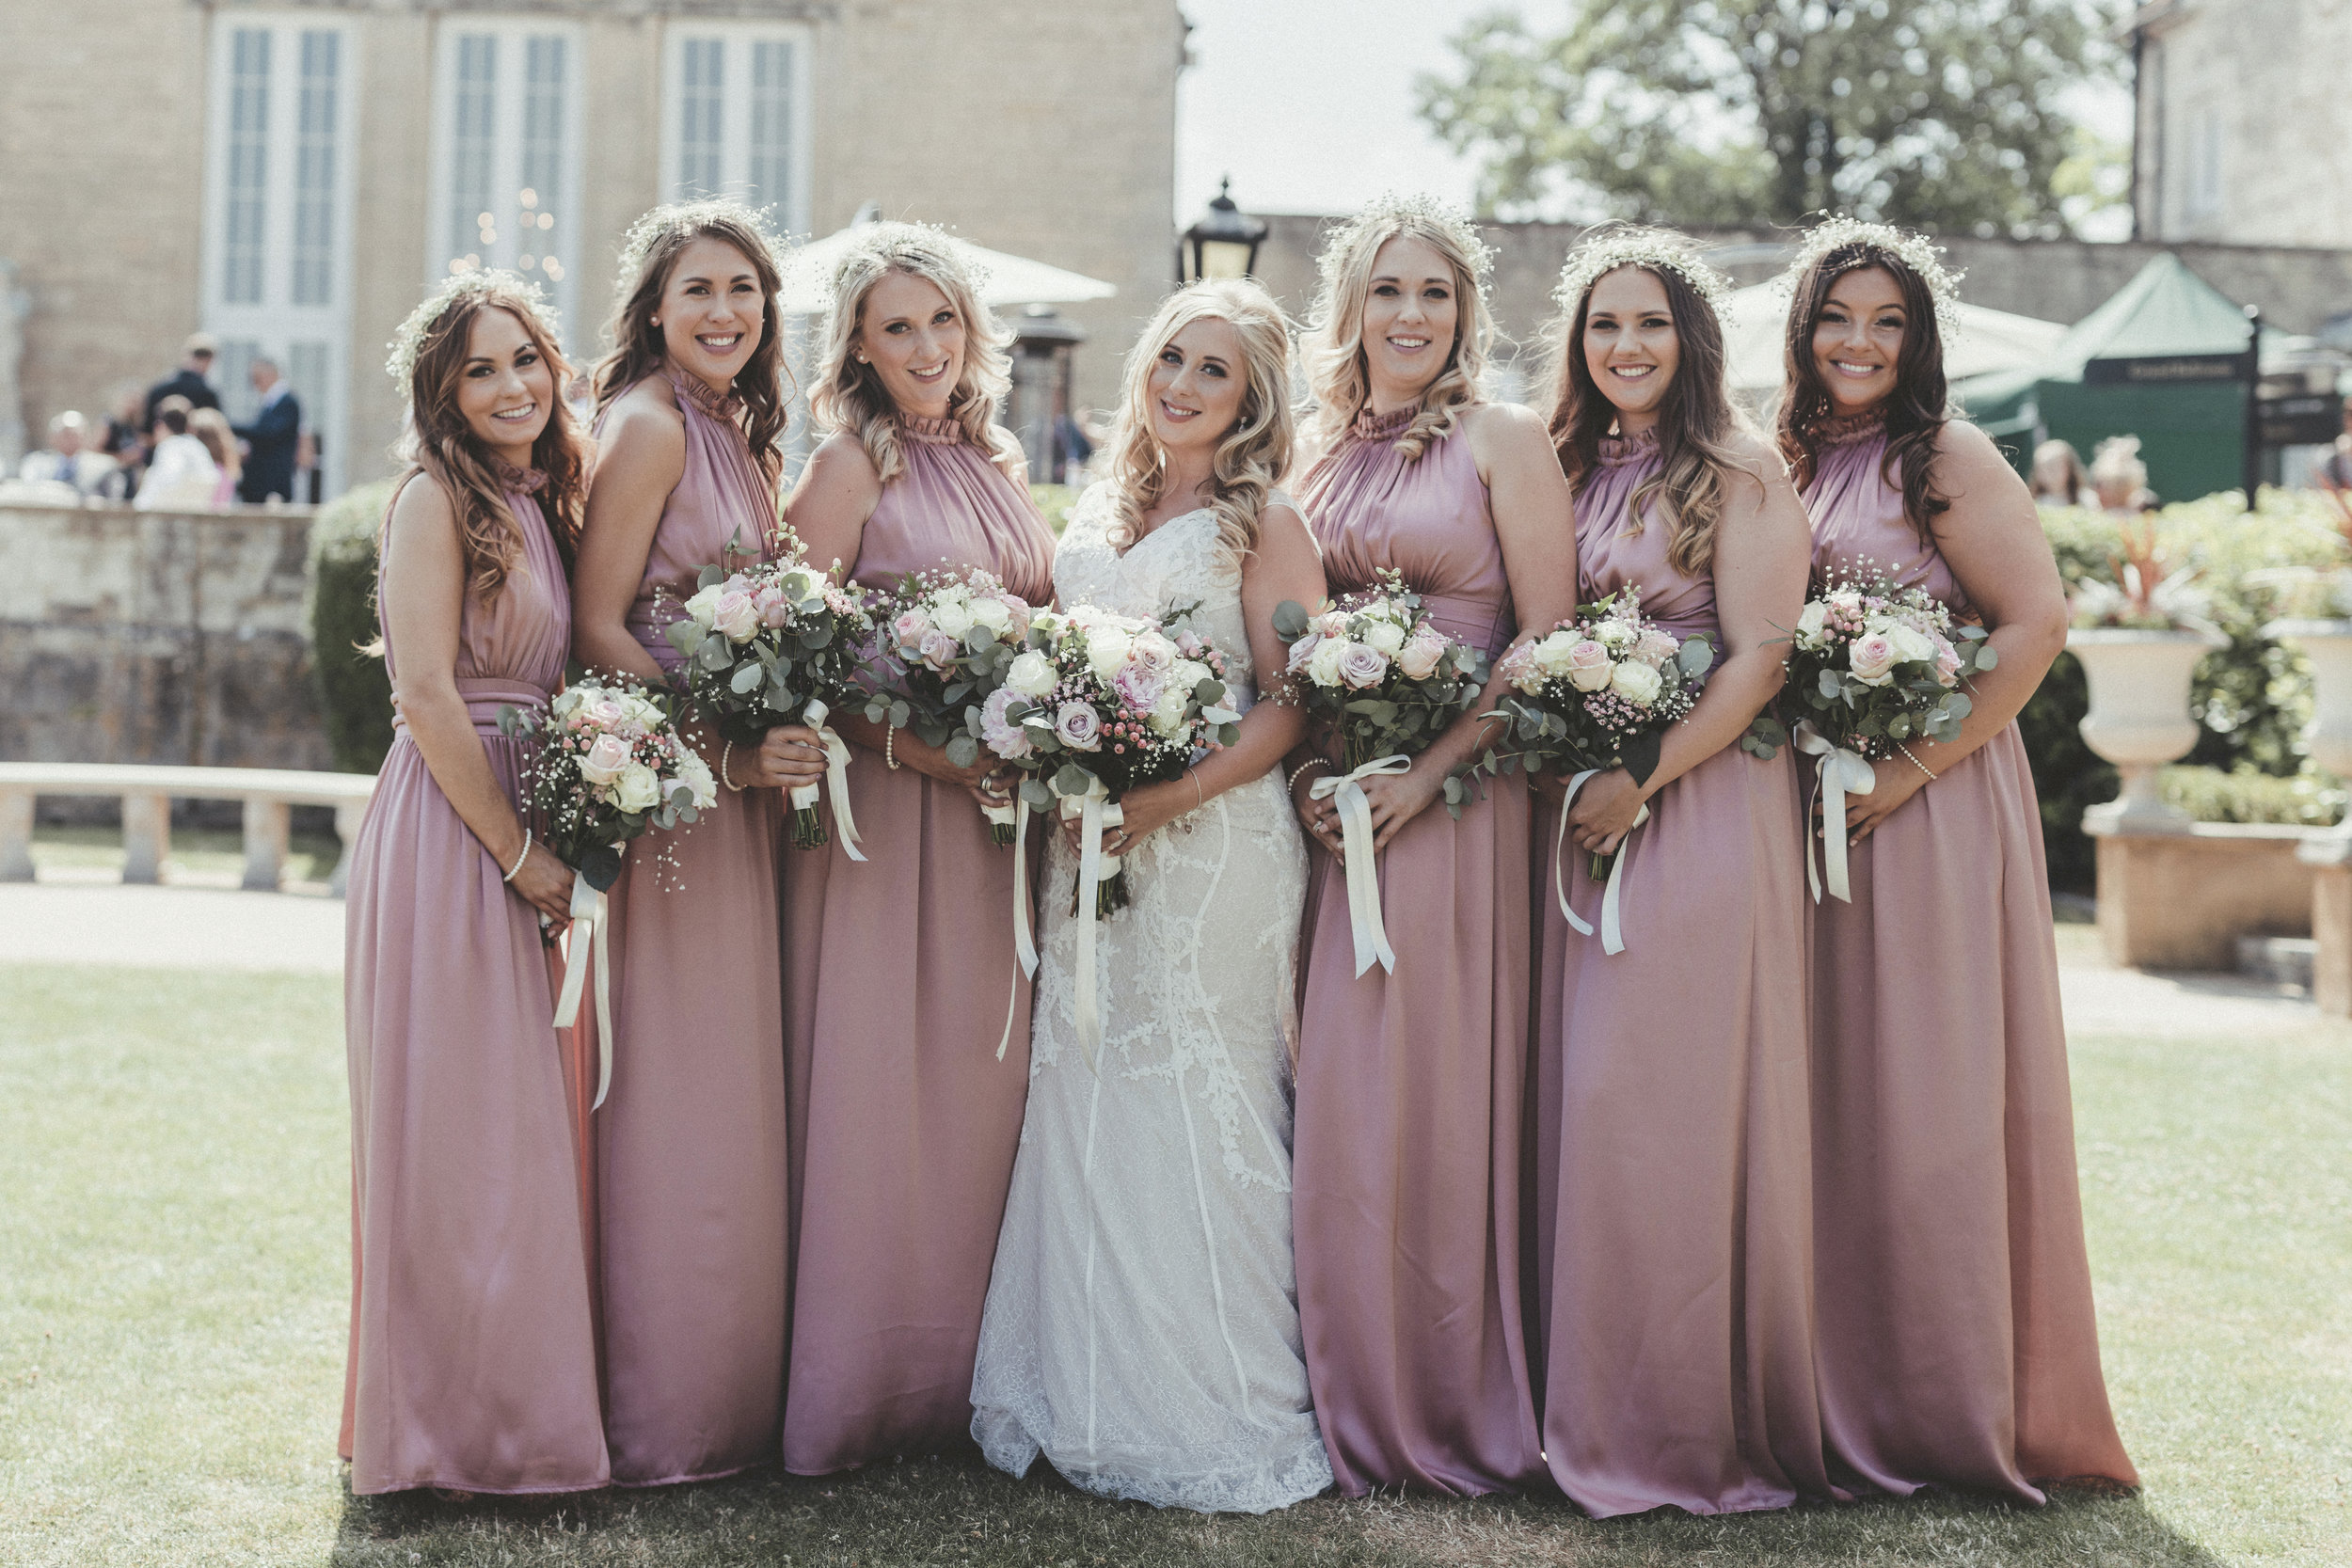 Bride and bridemsaids makeup and hair